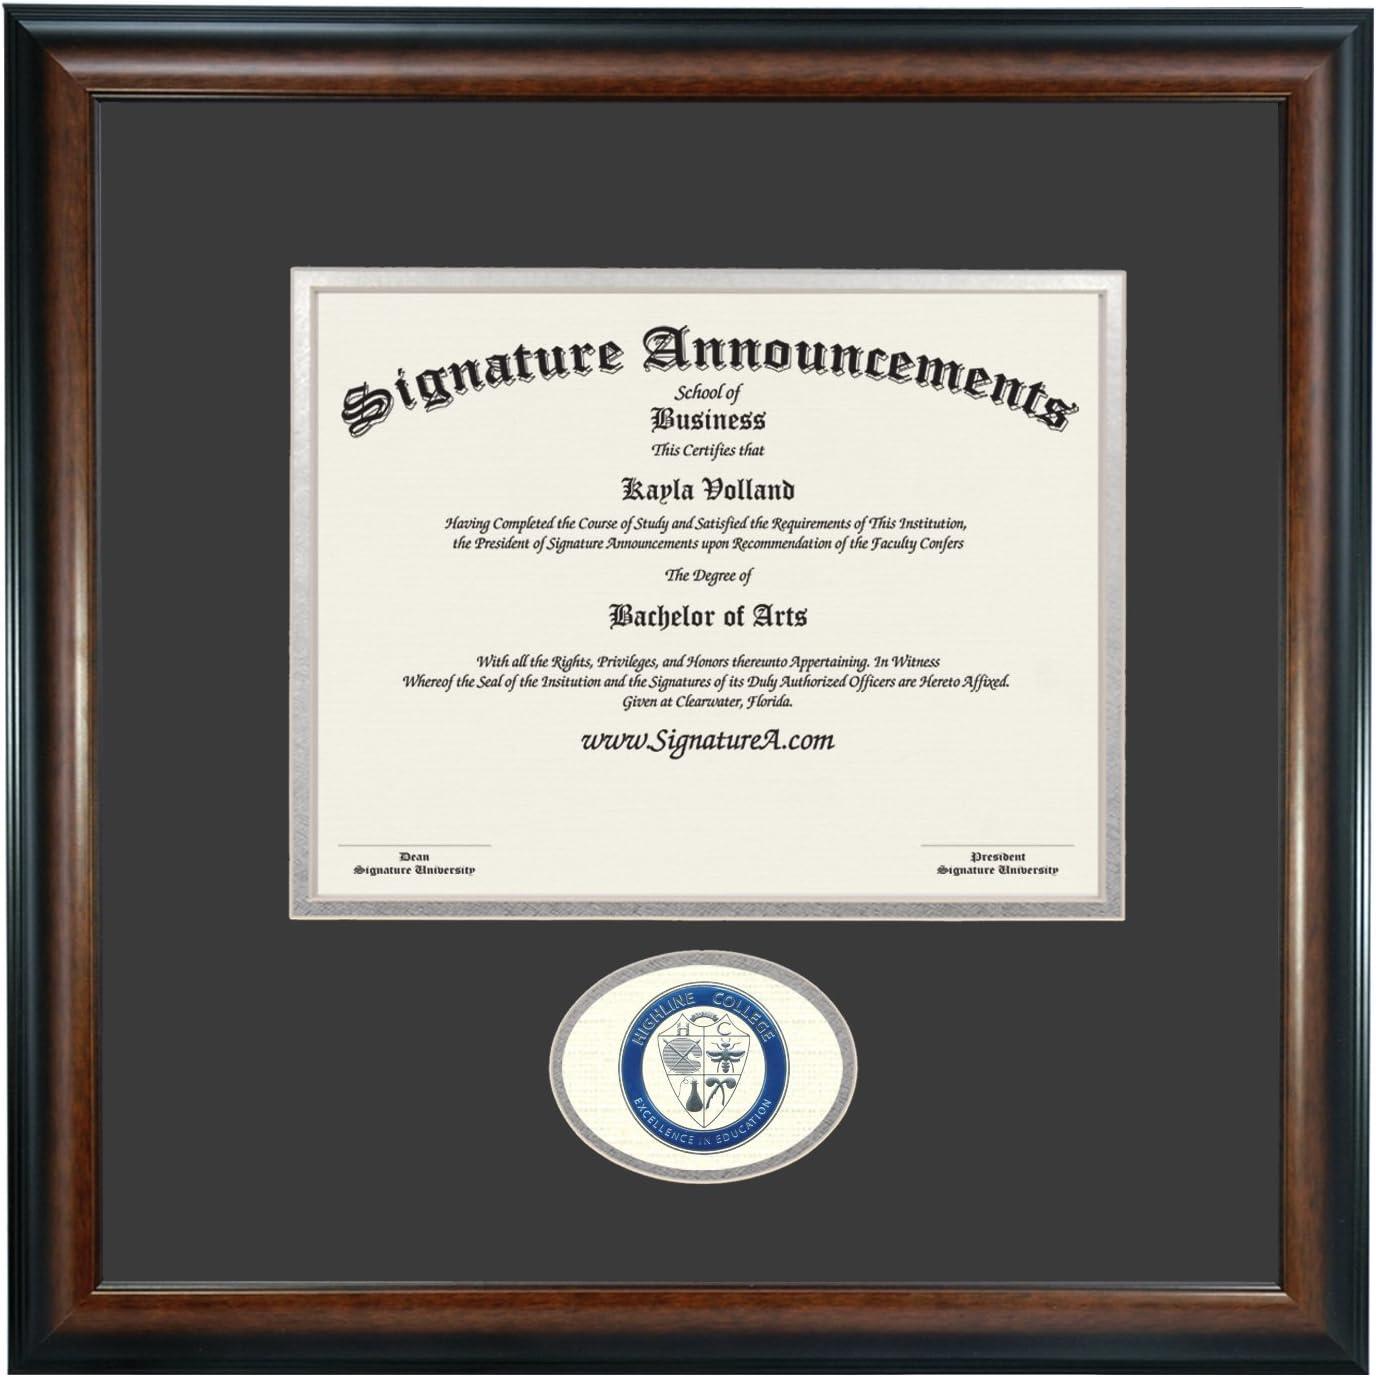 Signature Announcements Highline College Undergraduate Name /& Tassel Graduation Diploma Frame 16 x 16 Matte Mahogany Sculpted Foil Seal